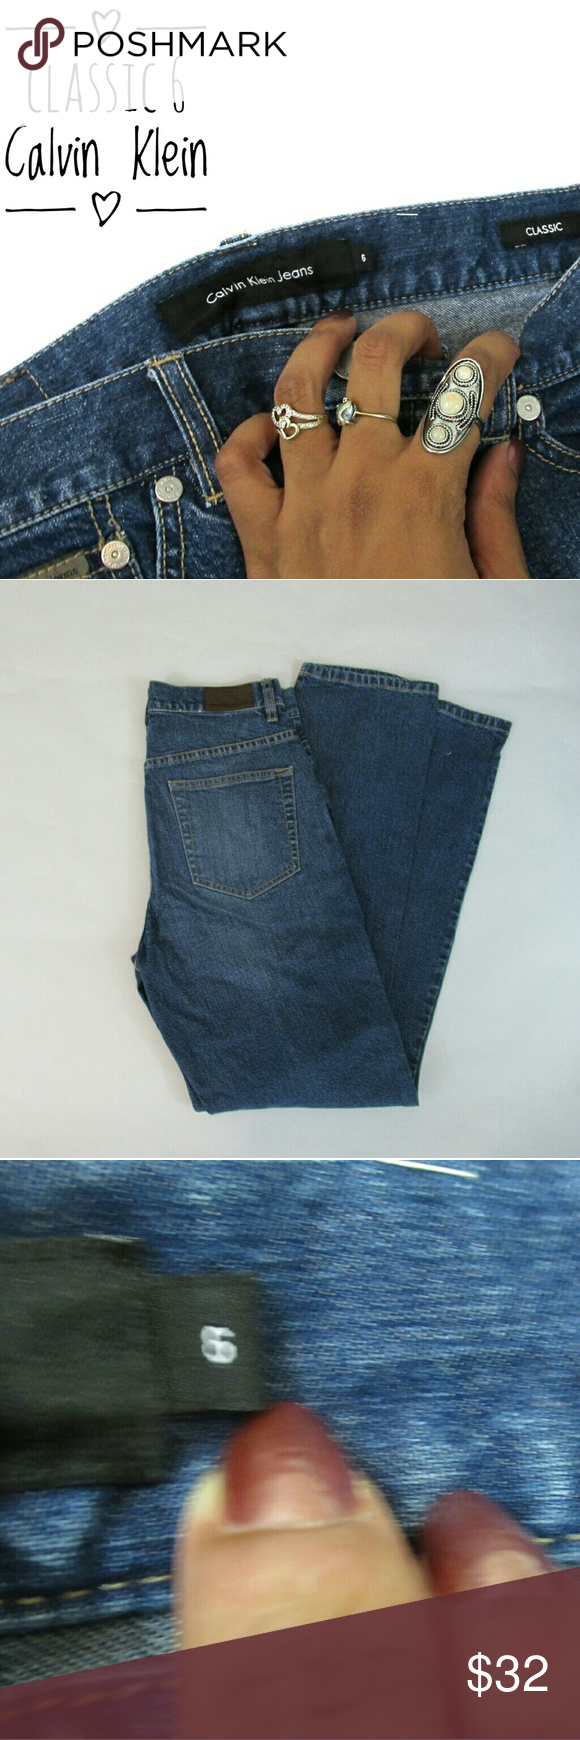 Classic Calvin Klein Jean Vintage 6 High Waist R Good condition Calvin Klein Jeans Jeans Straight Leg